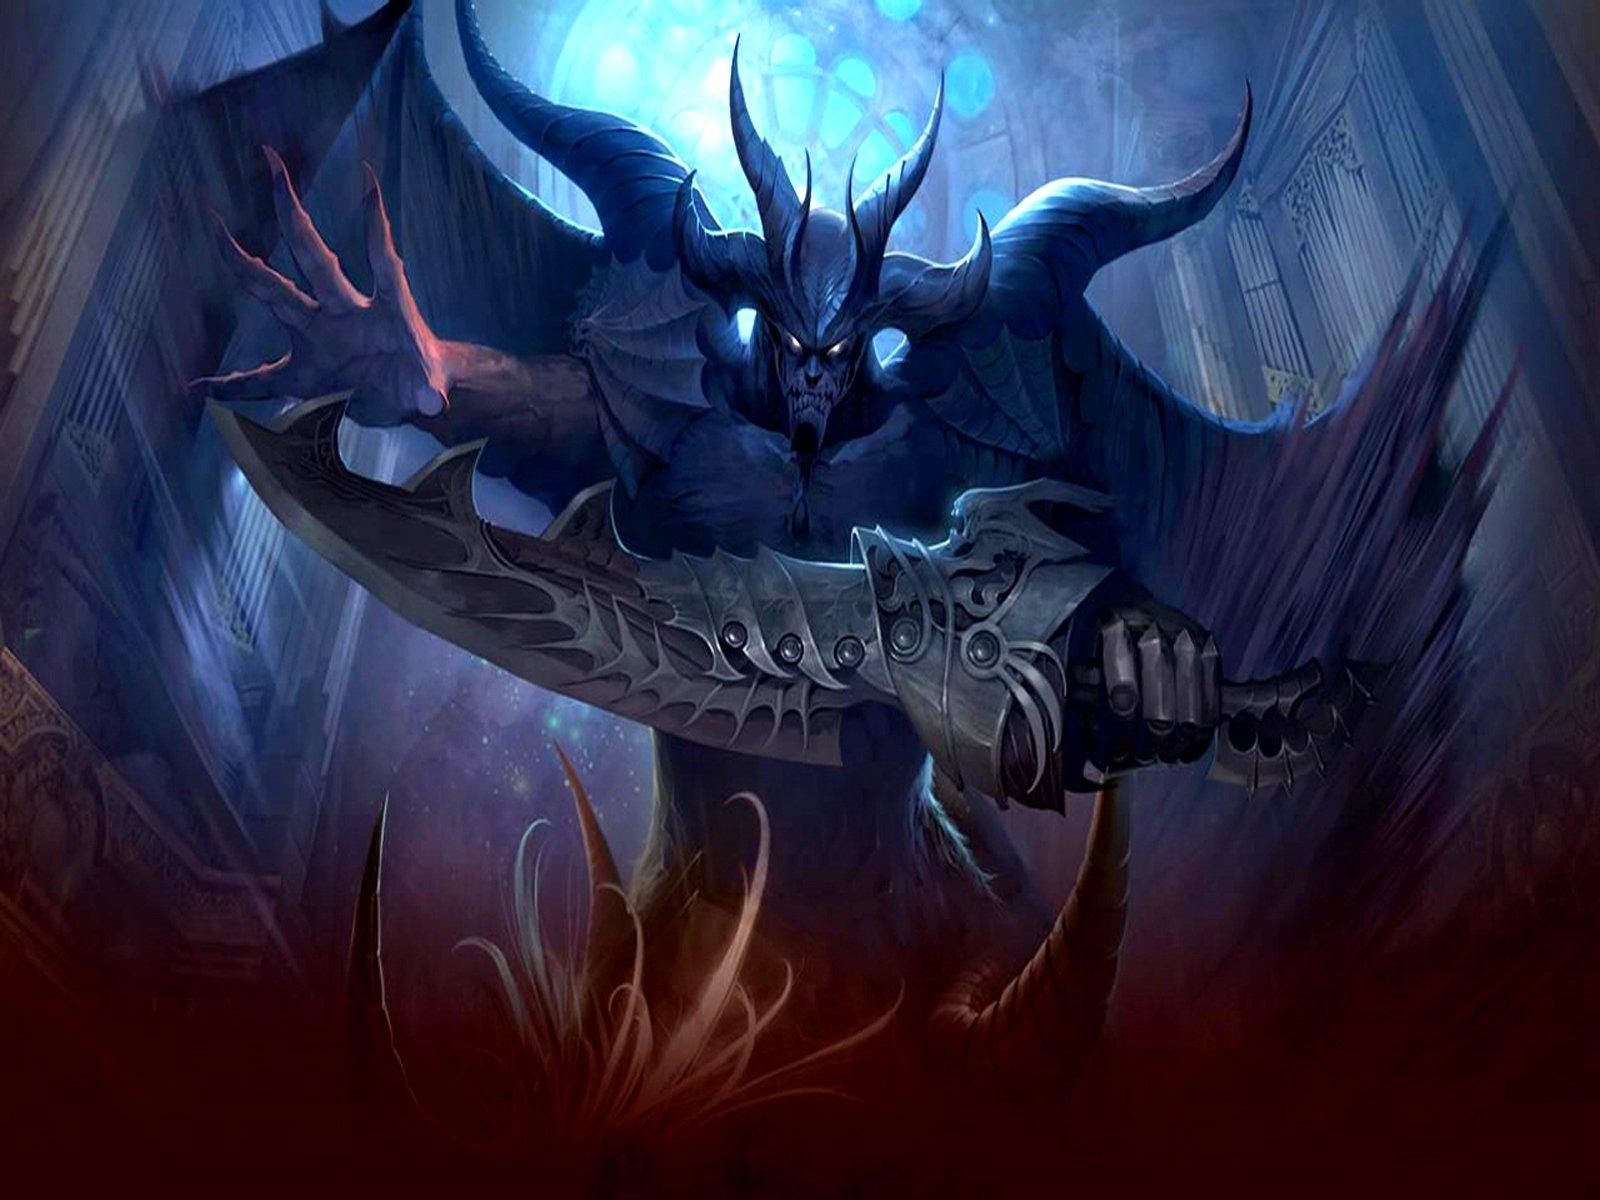 desecration demon wallpaper - photo #3